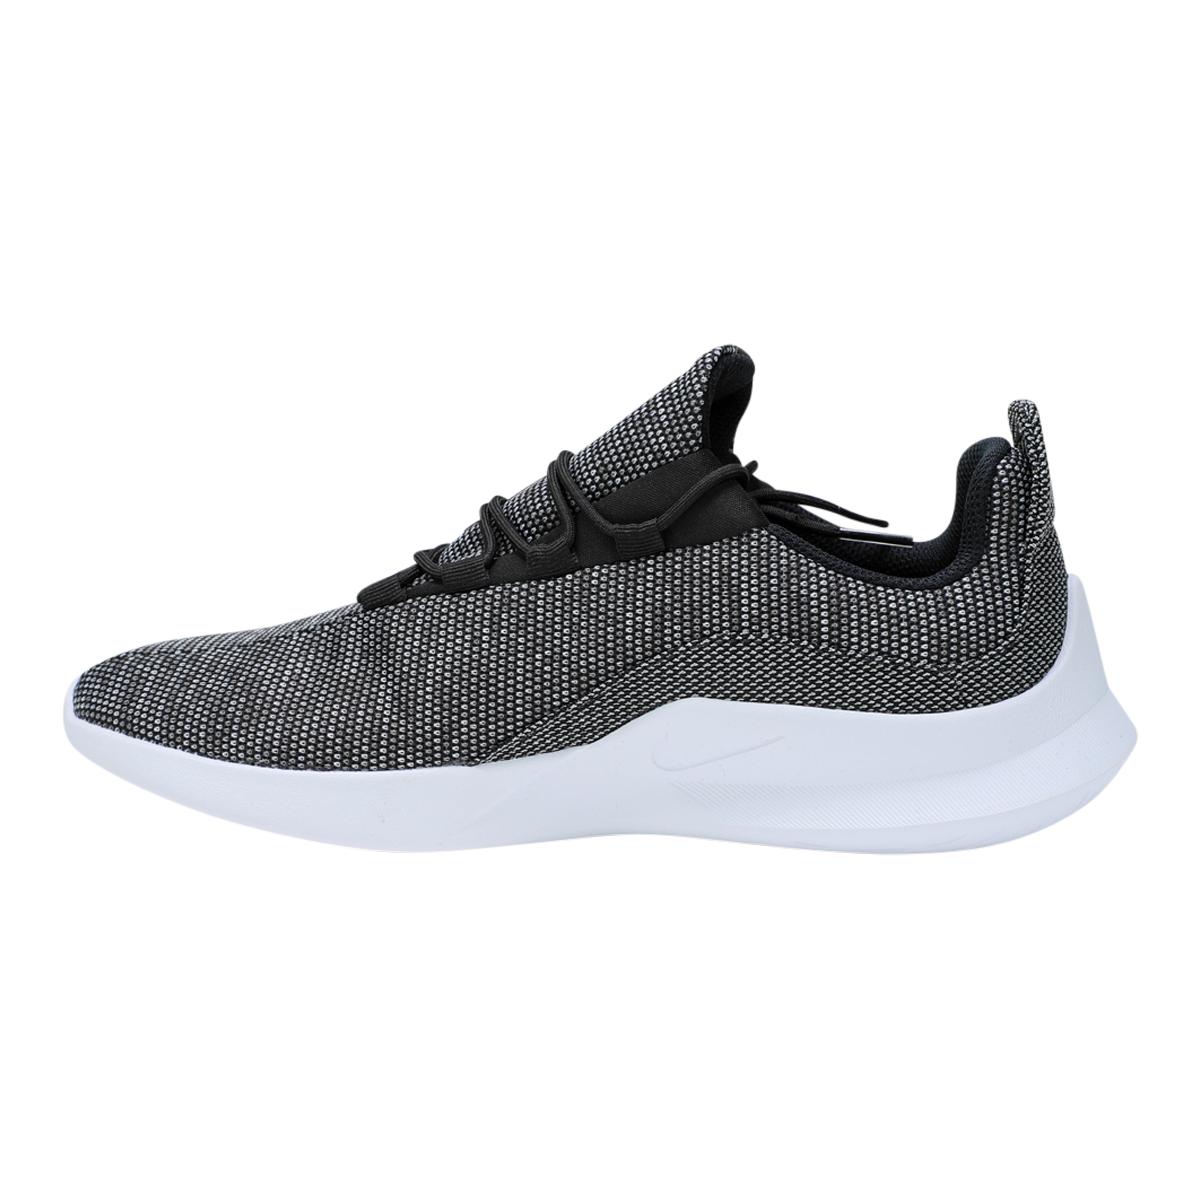 Nike-Men-039-s-Viale-Premium-Running-Shoes thumbnail 8